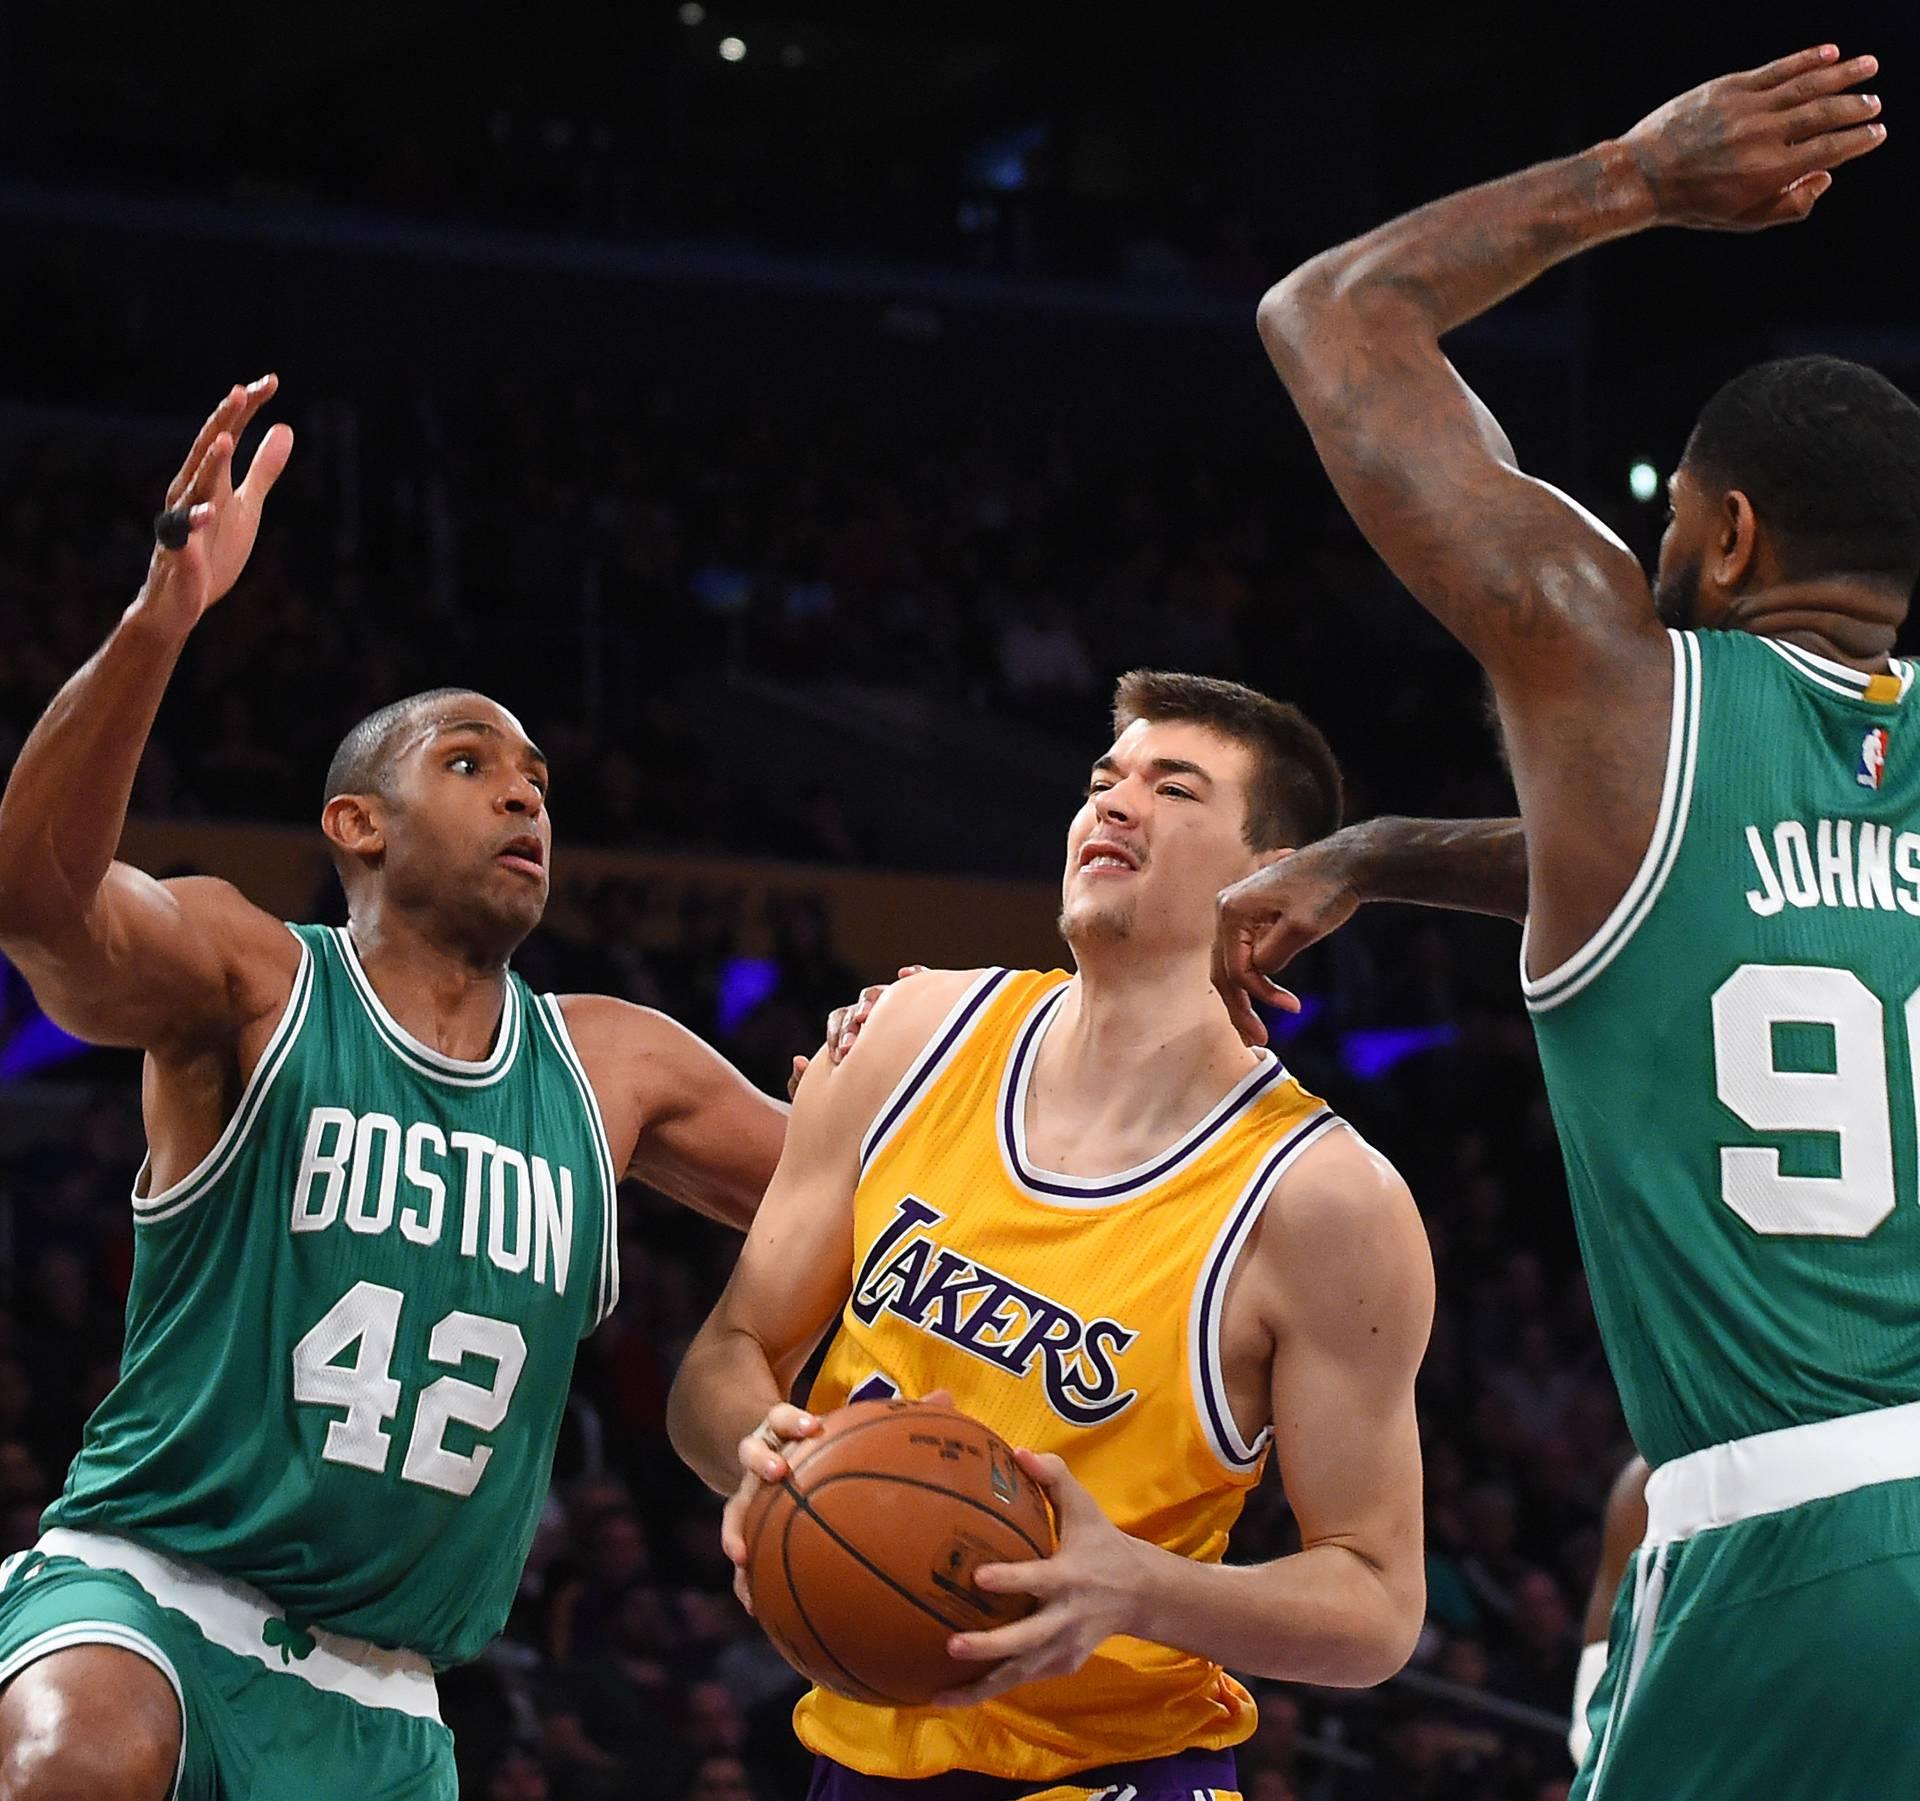 NBA: Boston Celtics at Los Angeles Lakers